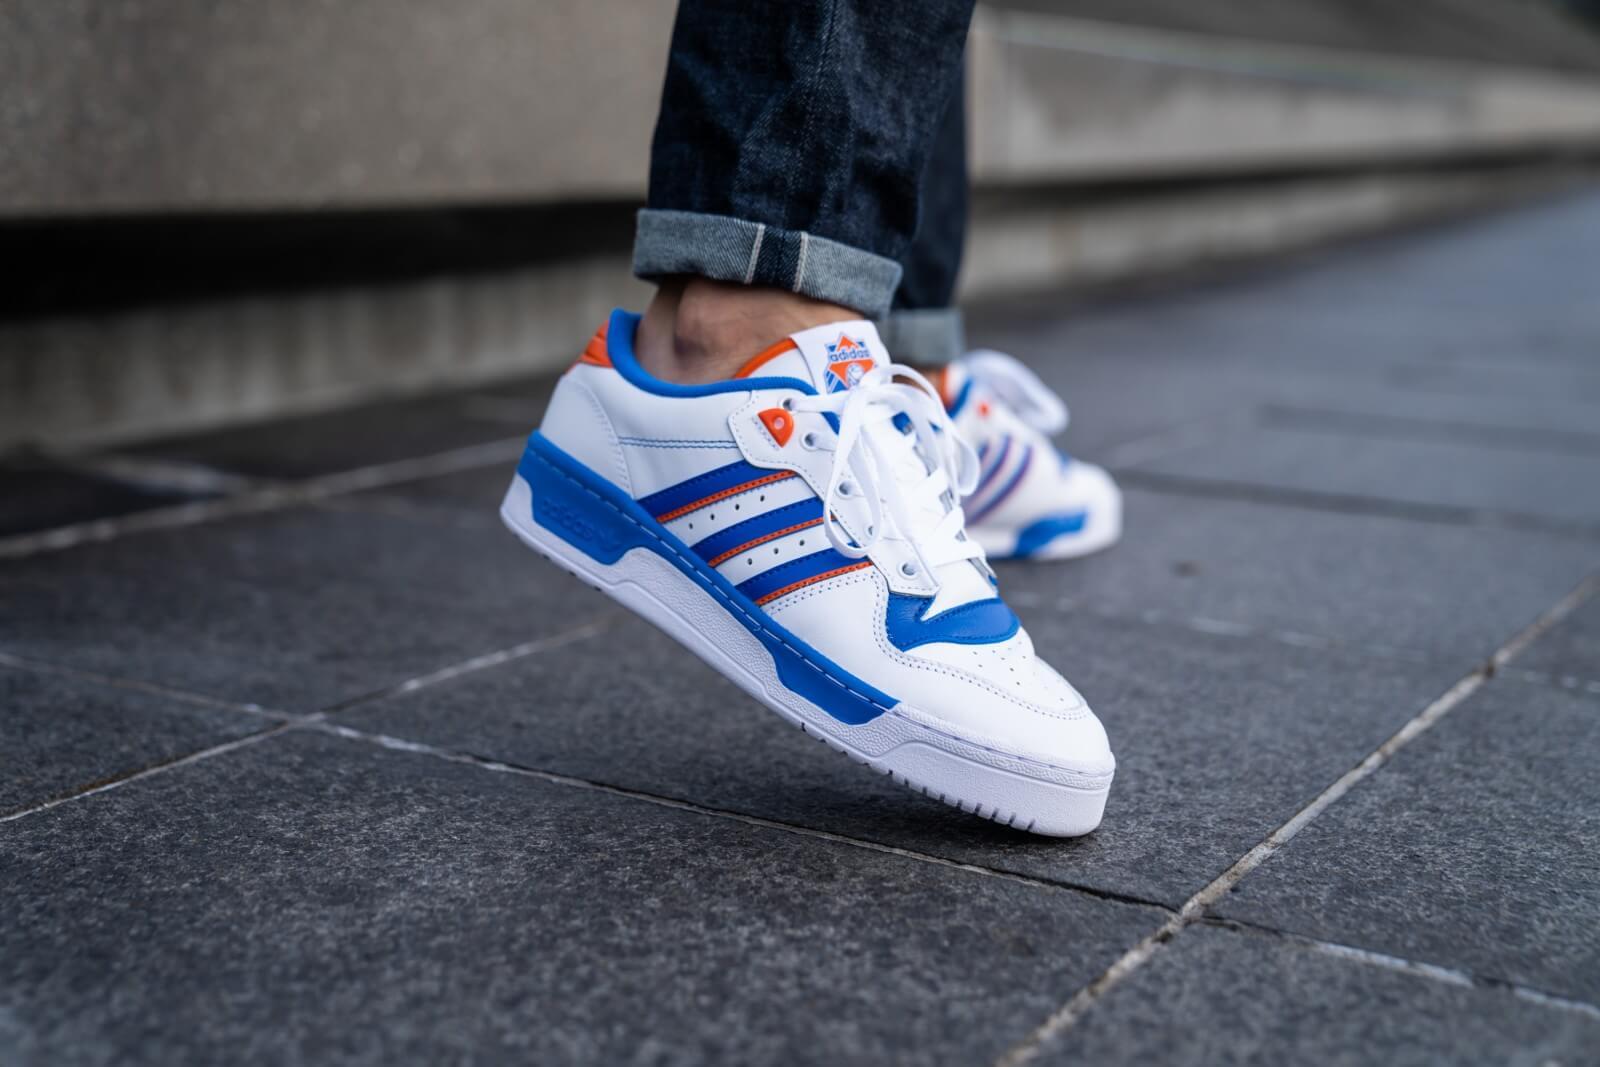 Adidas Rivalry Low Footwear White/Blue